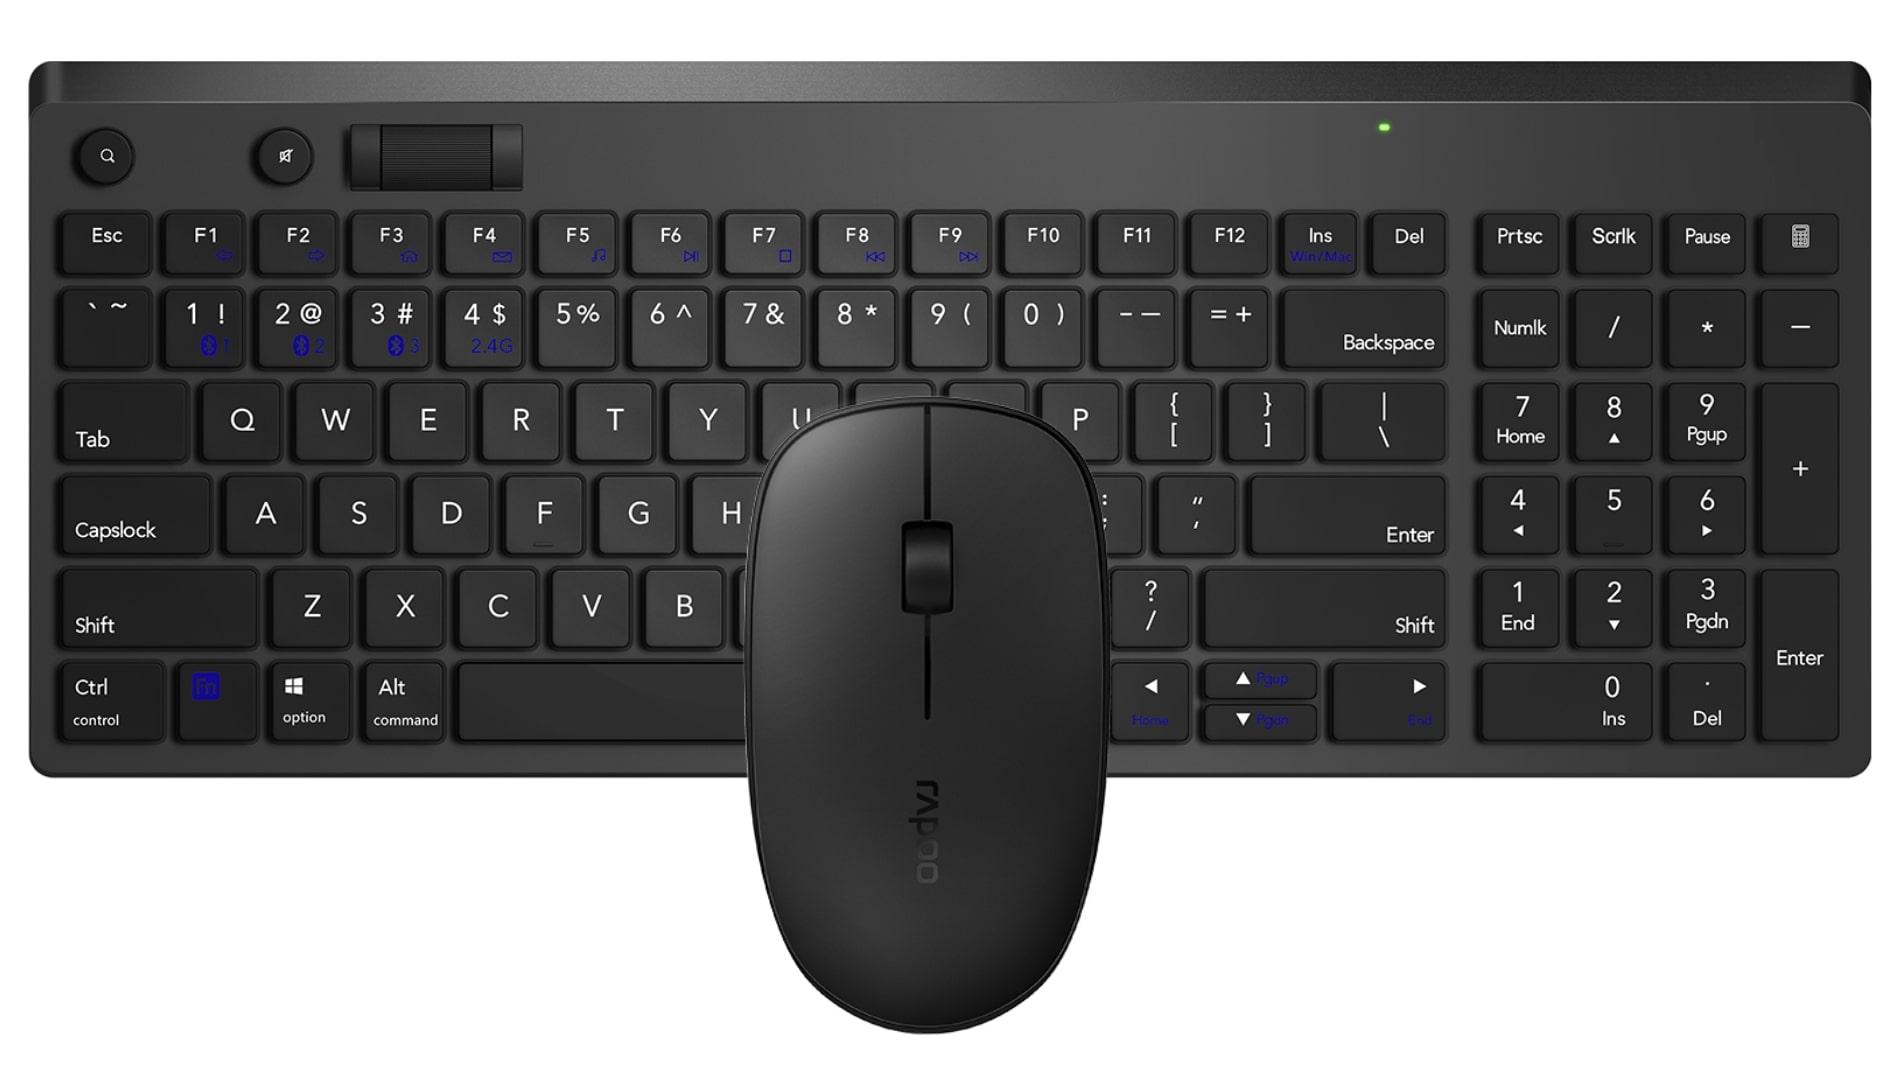 Teclado e Mouse Combo Sem Fio Dual Mode Bluetooth + Wireless 2.4GHz Rapoo 8050T RA003 Garantia 5 ano